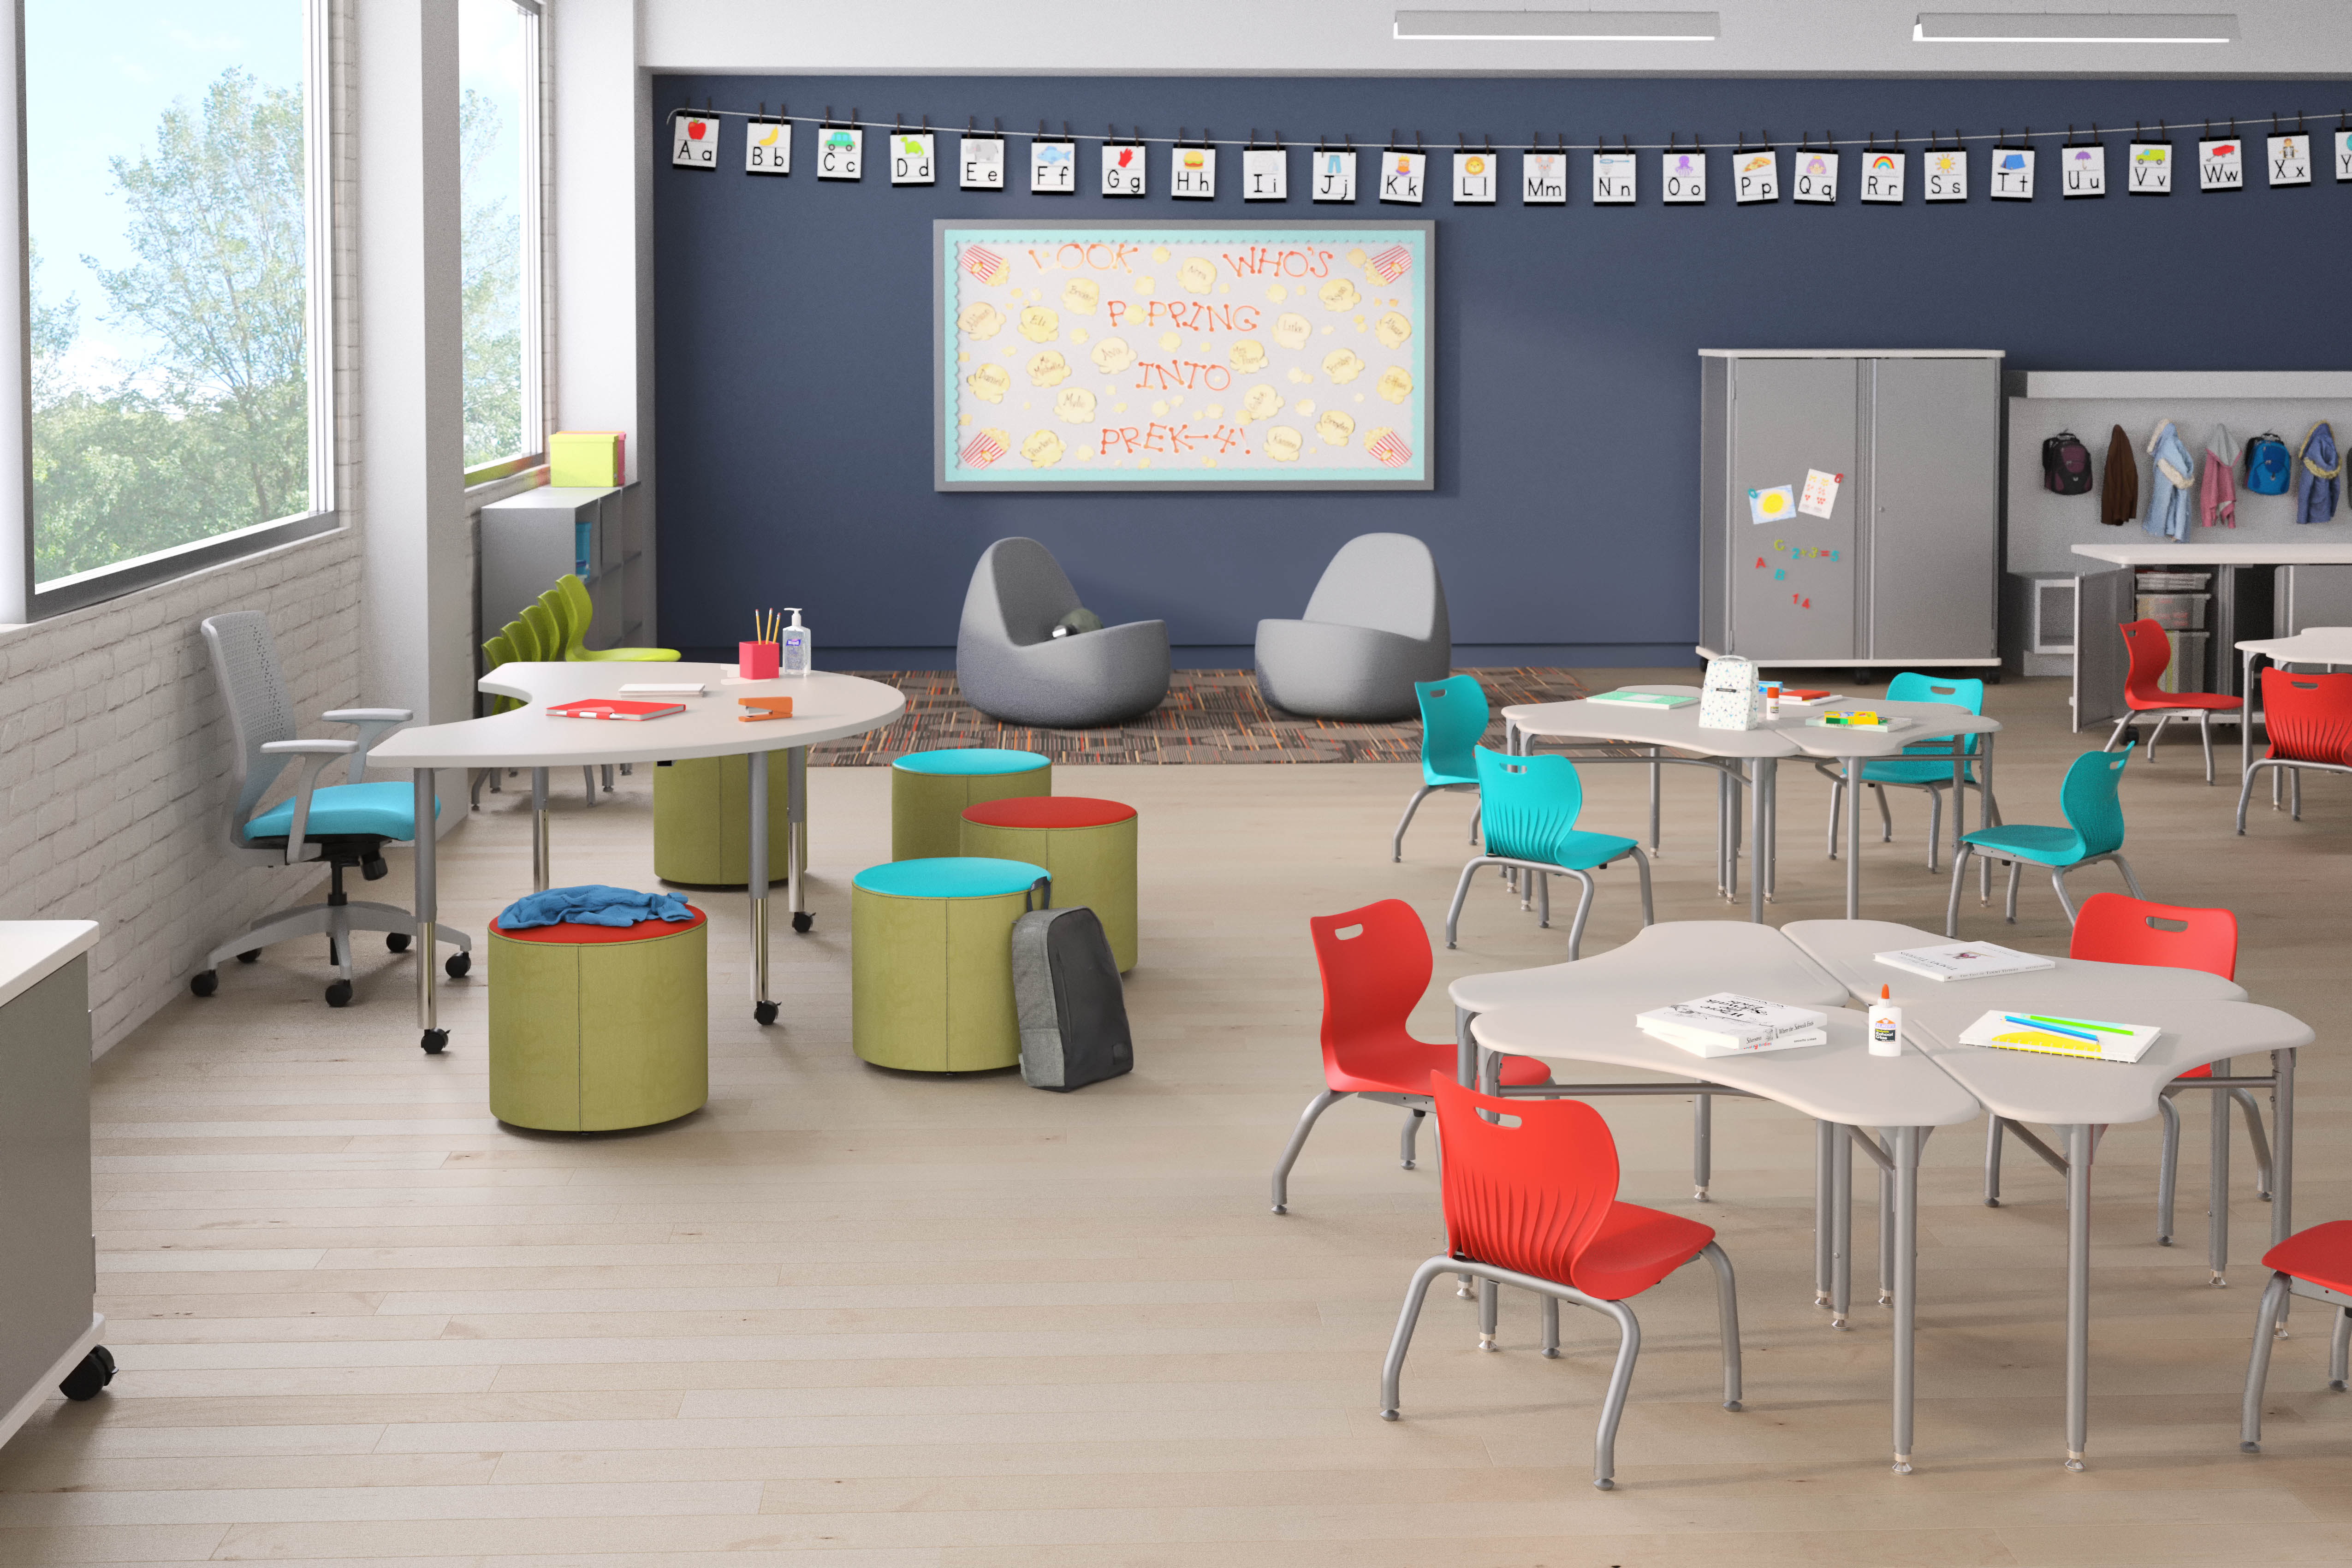 K12 Classroom